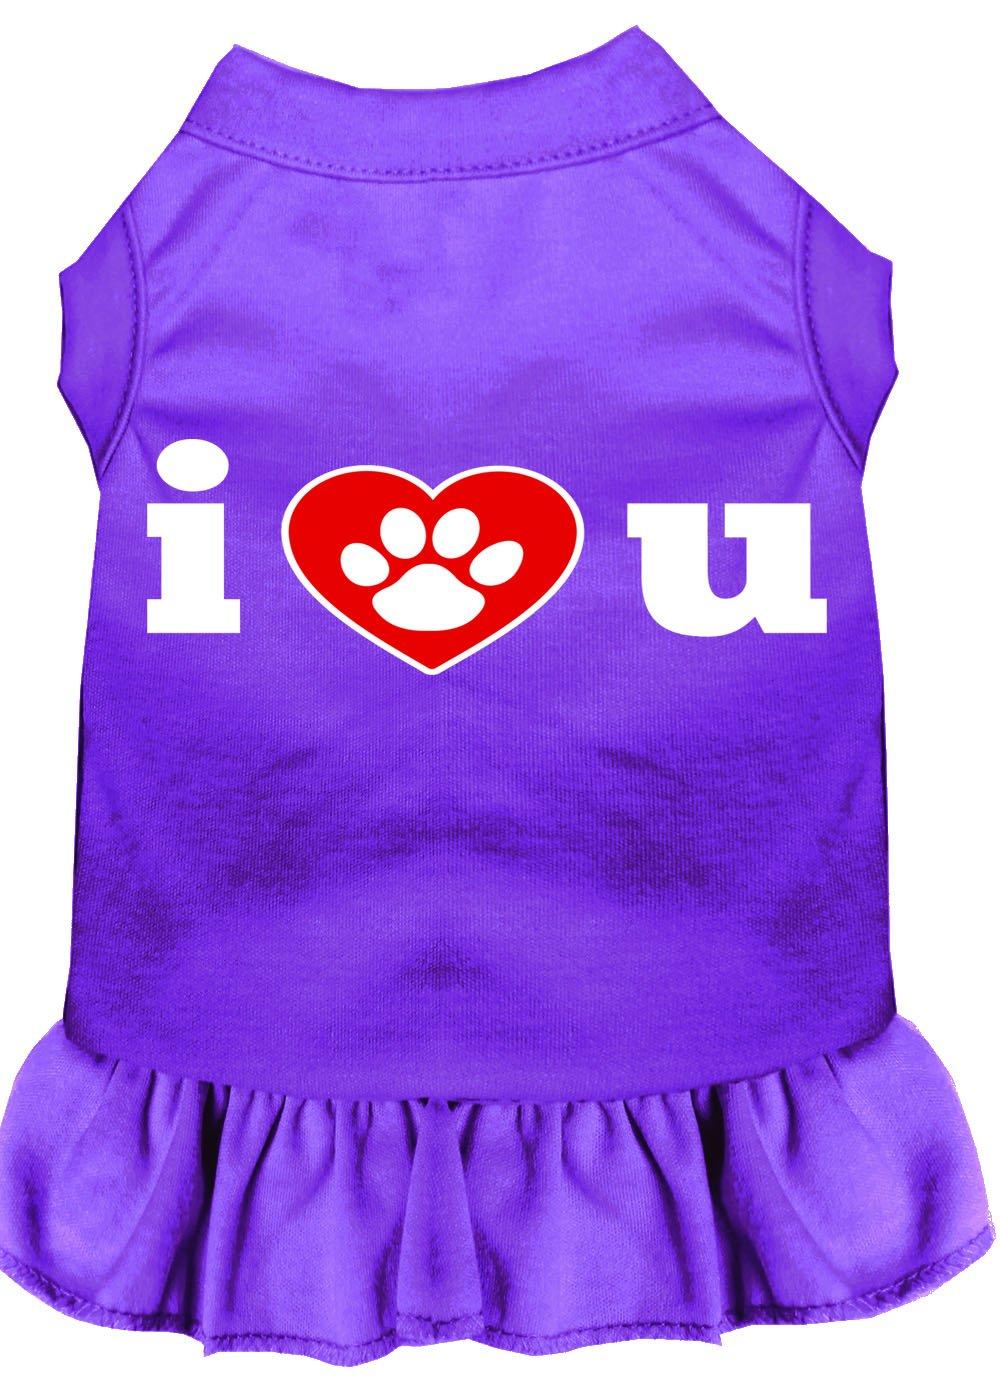 Mirage Pet Products 58-09 XXLPR Purple I Heart You Screen Print Dress, XX-Large